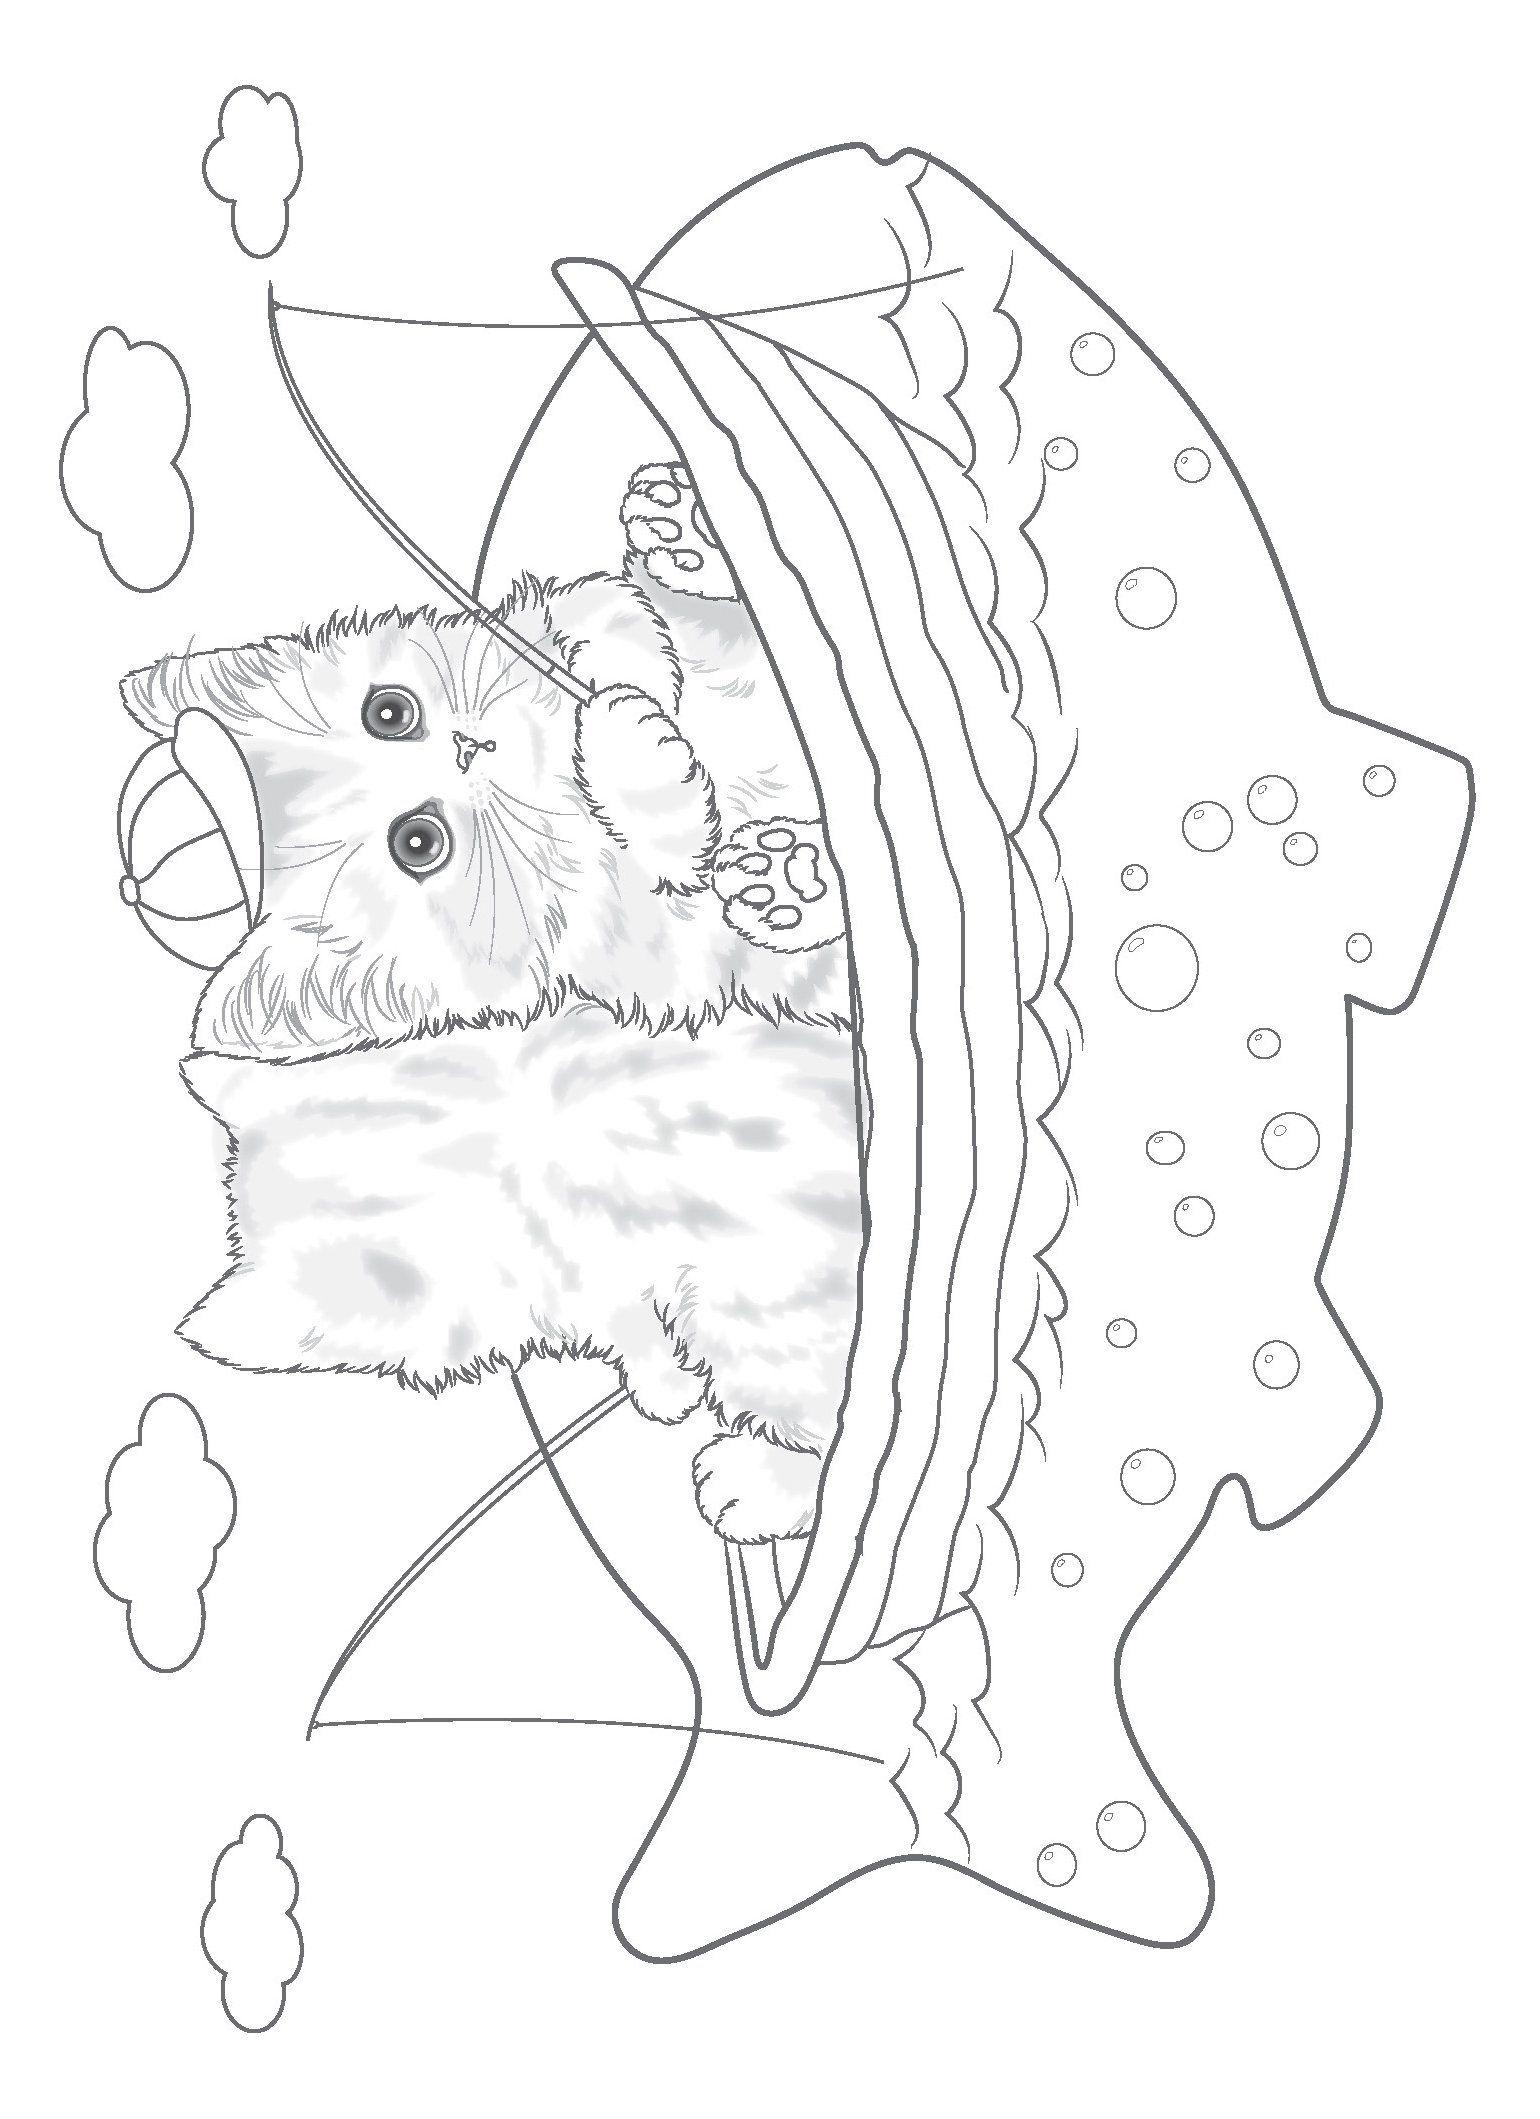 Teacup Kittens Coloring Book (Colouring Books): Amazon.de: Kayomi ...